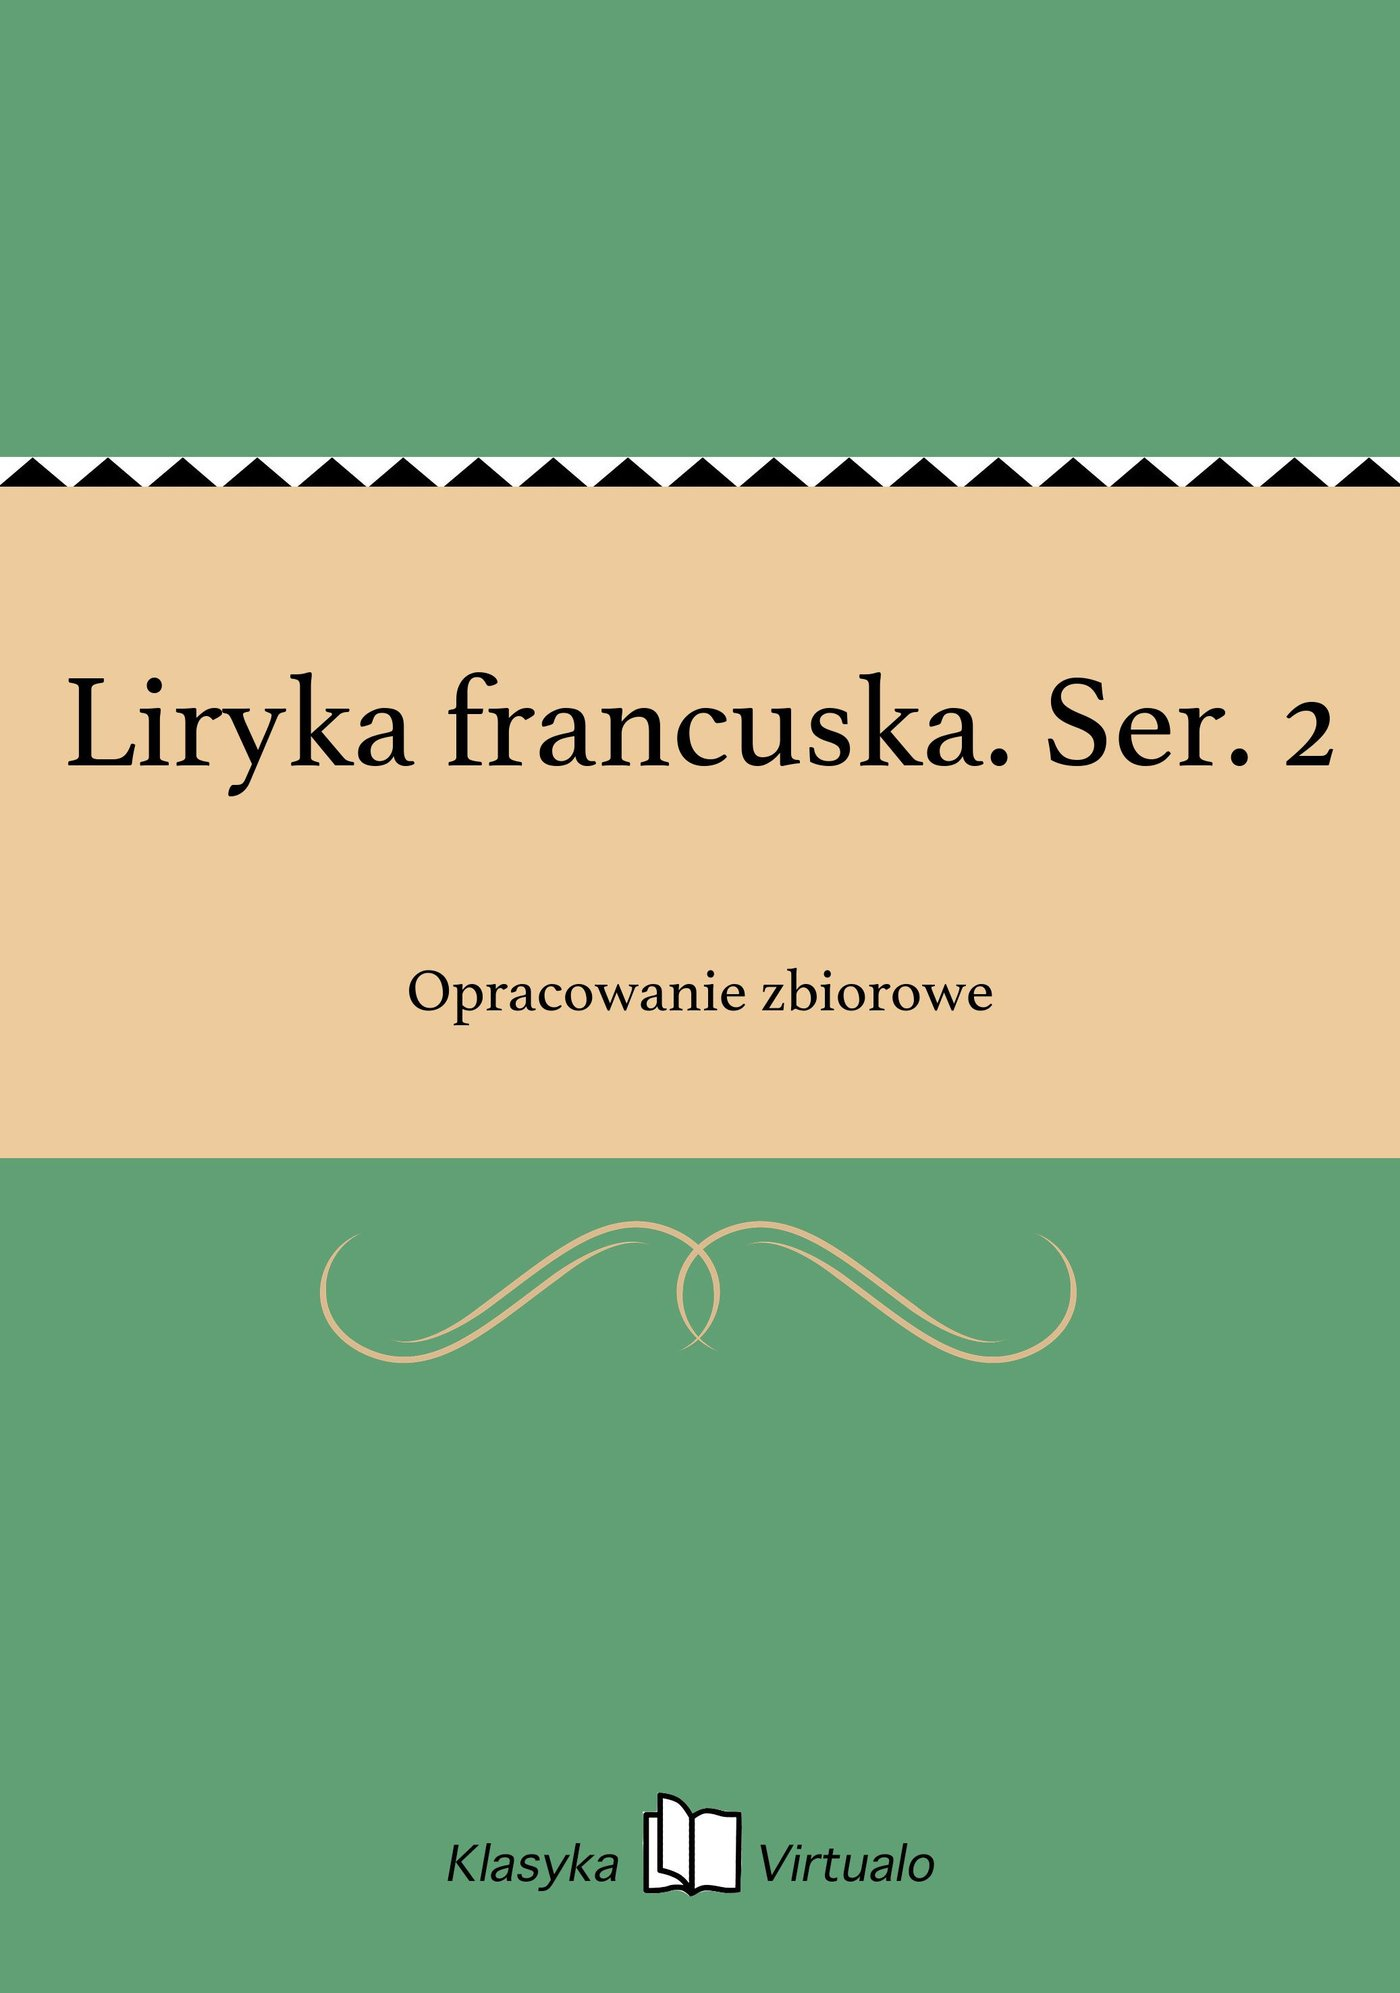 Liryka francuska. Ser. 2 - Ebook (Książka na Kindle) do pobrania w formacie MOBI